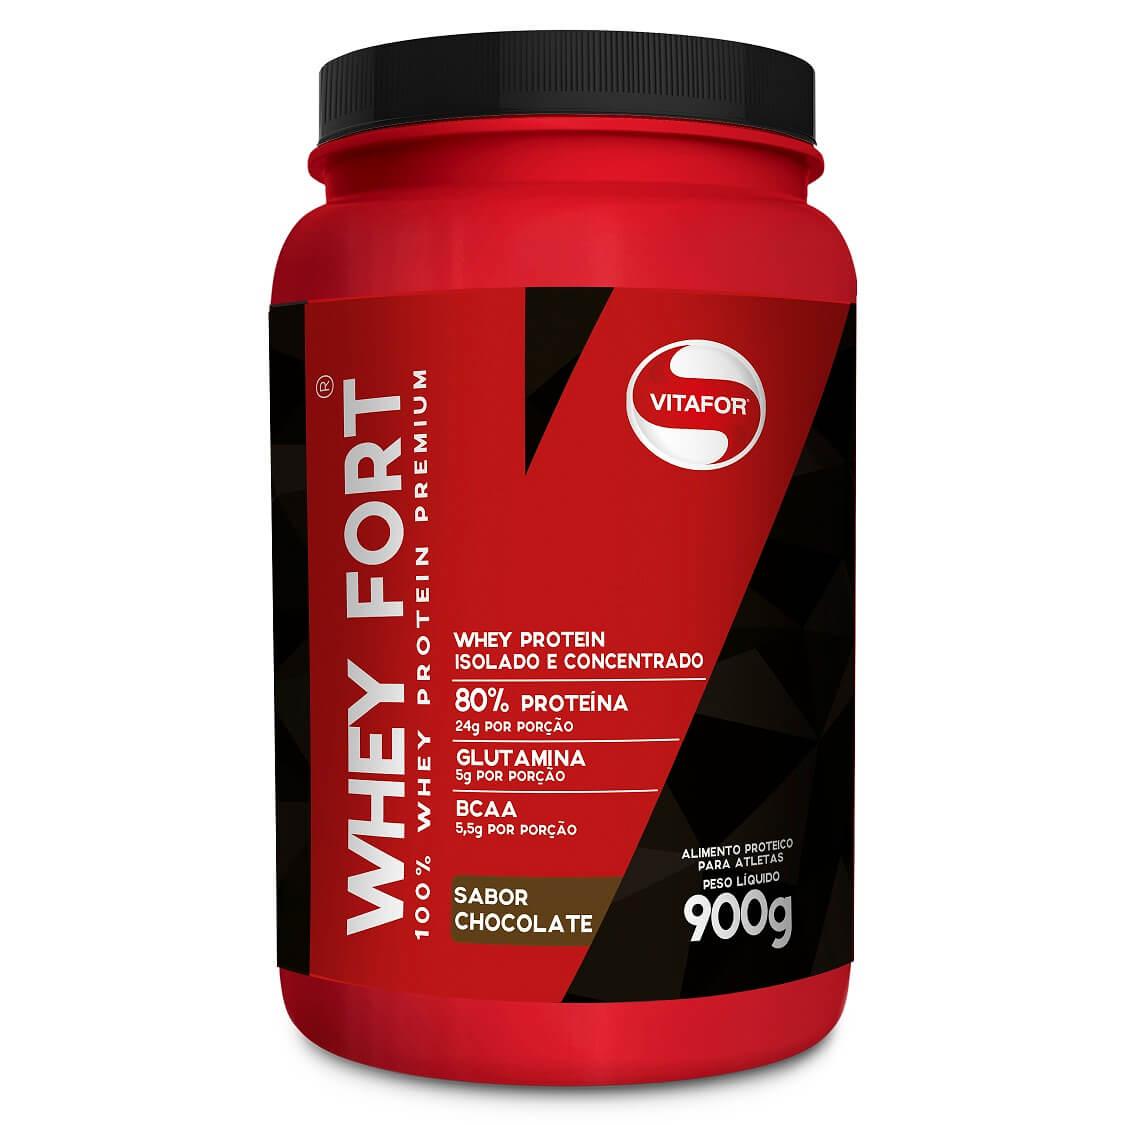 WHEY FORT SABOR CHOCOLATE - 900g - VITAFOR